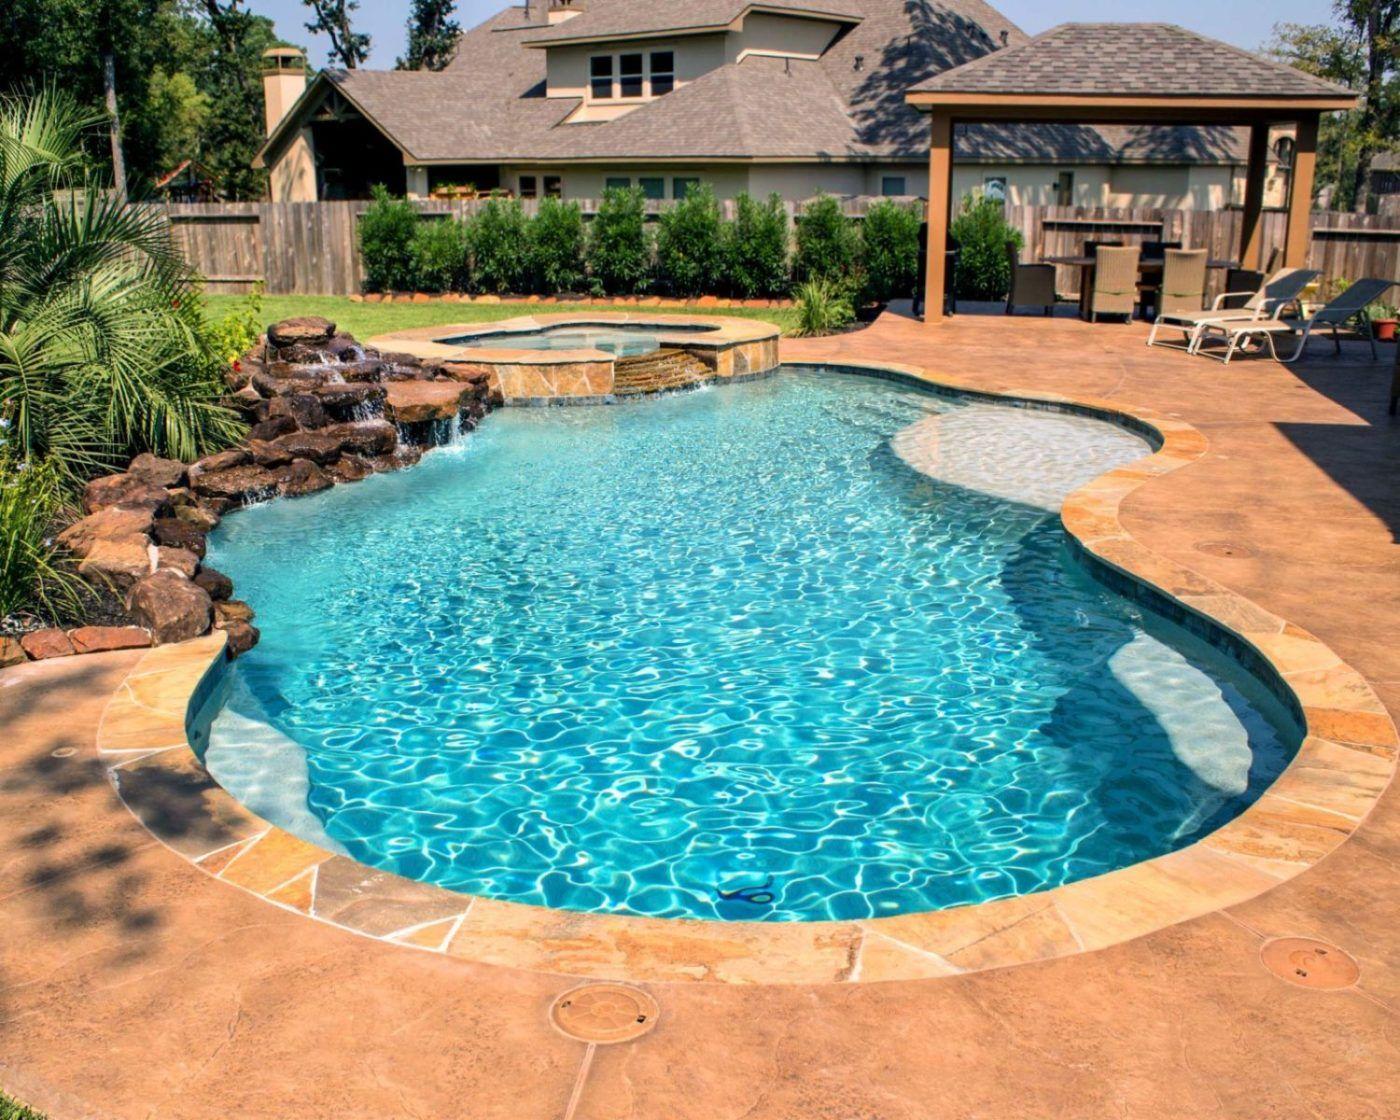 Swimming Pool Pricing 50k 60k Custom Pools Platinum Pools Pool Prices Cool Swimming Pools Swimming Pool Prices